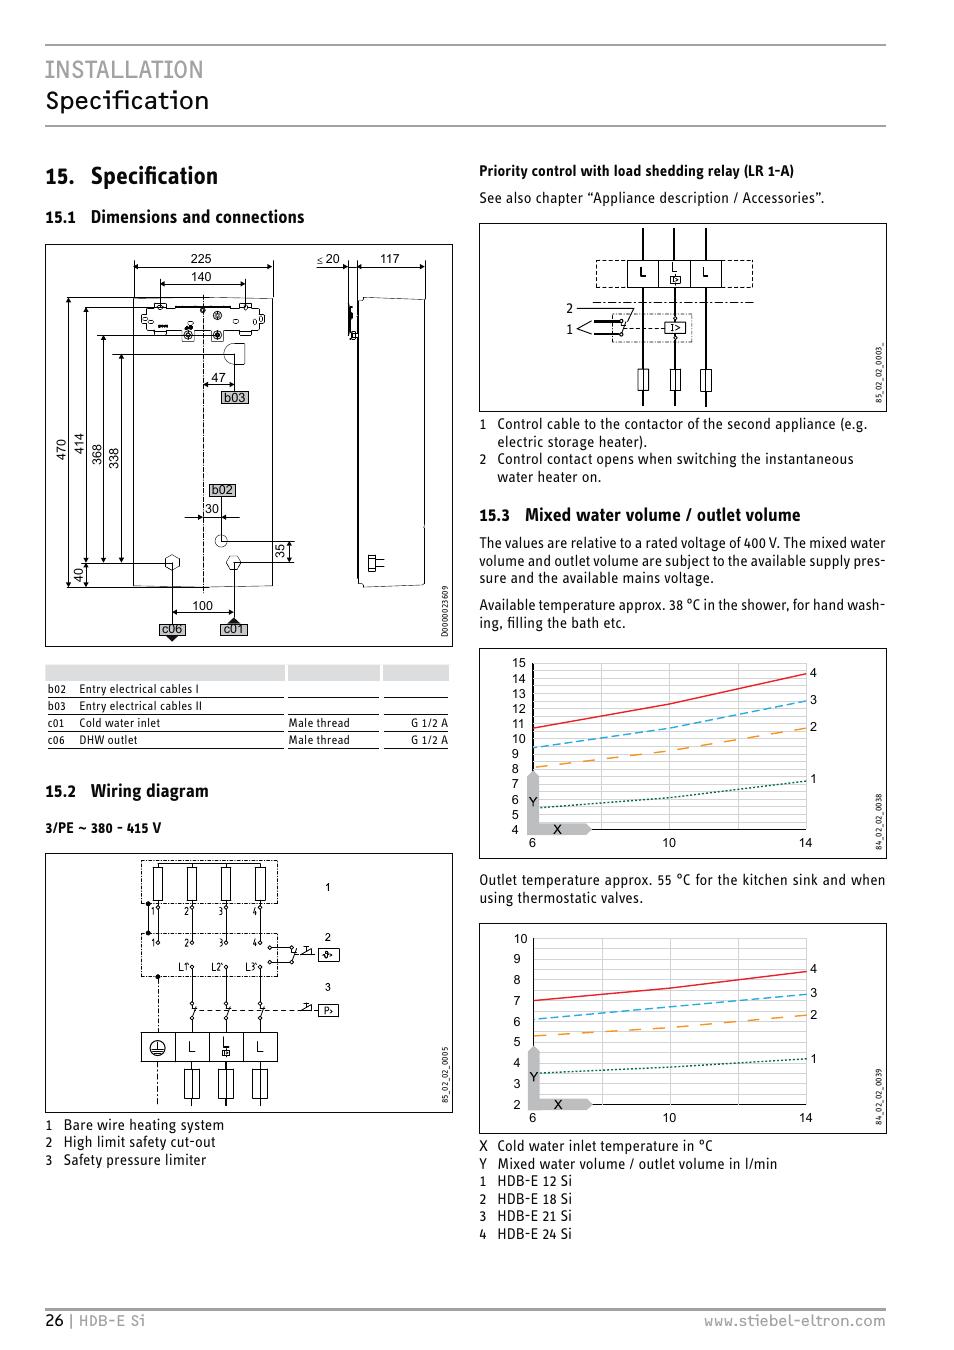 Installation Speci U00f0cation 15  Speci Ufb01cation  1 Dimensions